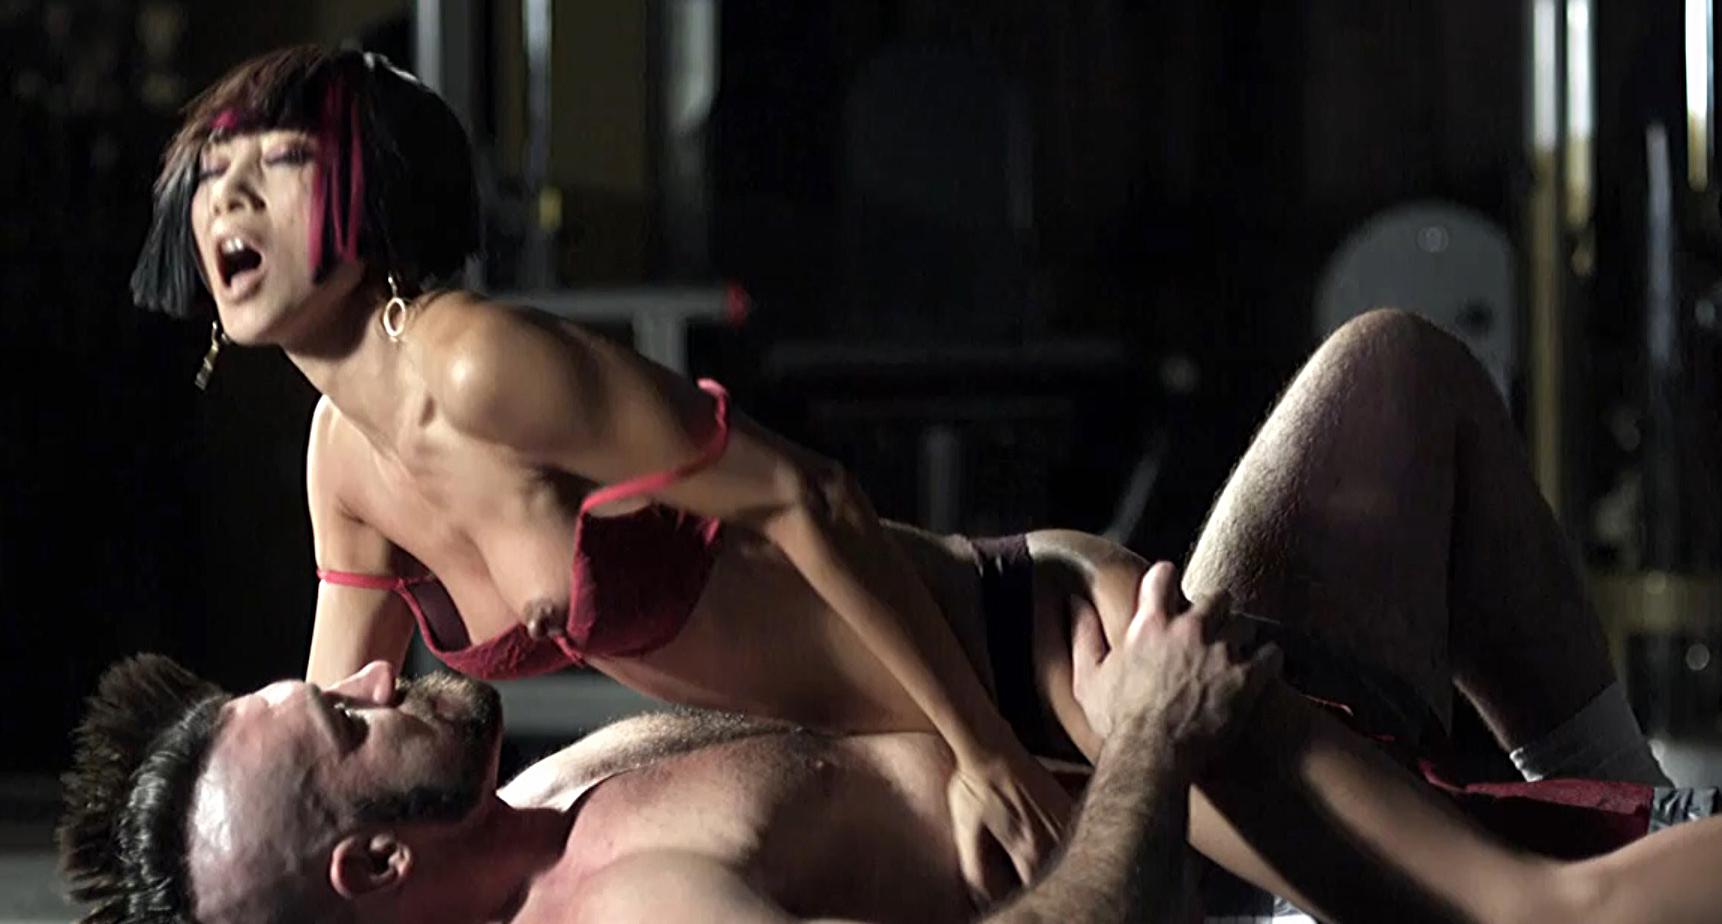 Bai Ling Nude bai ling nude sex scene in circle of pain movie - free video